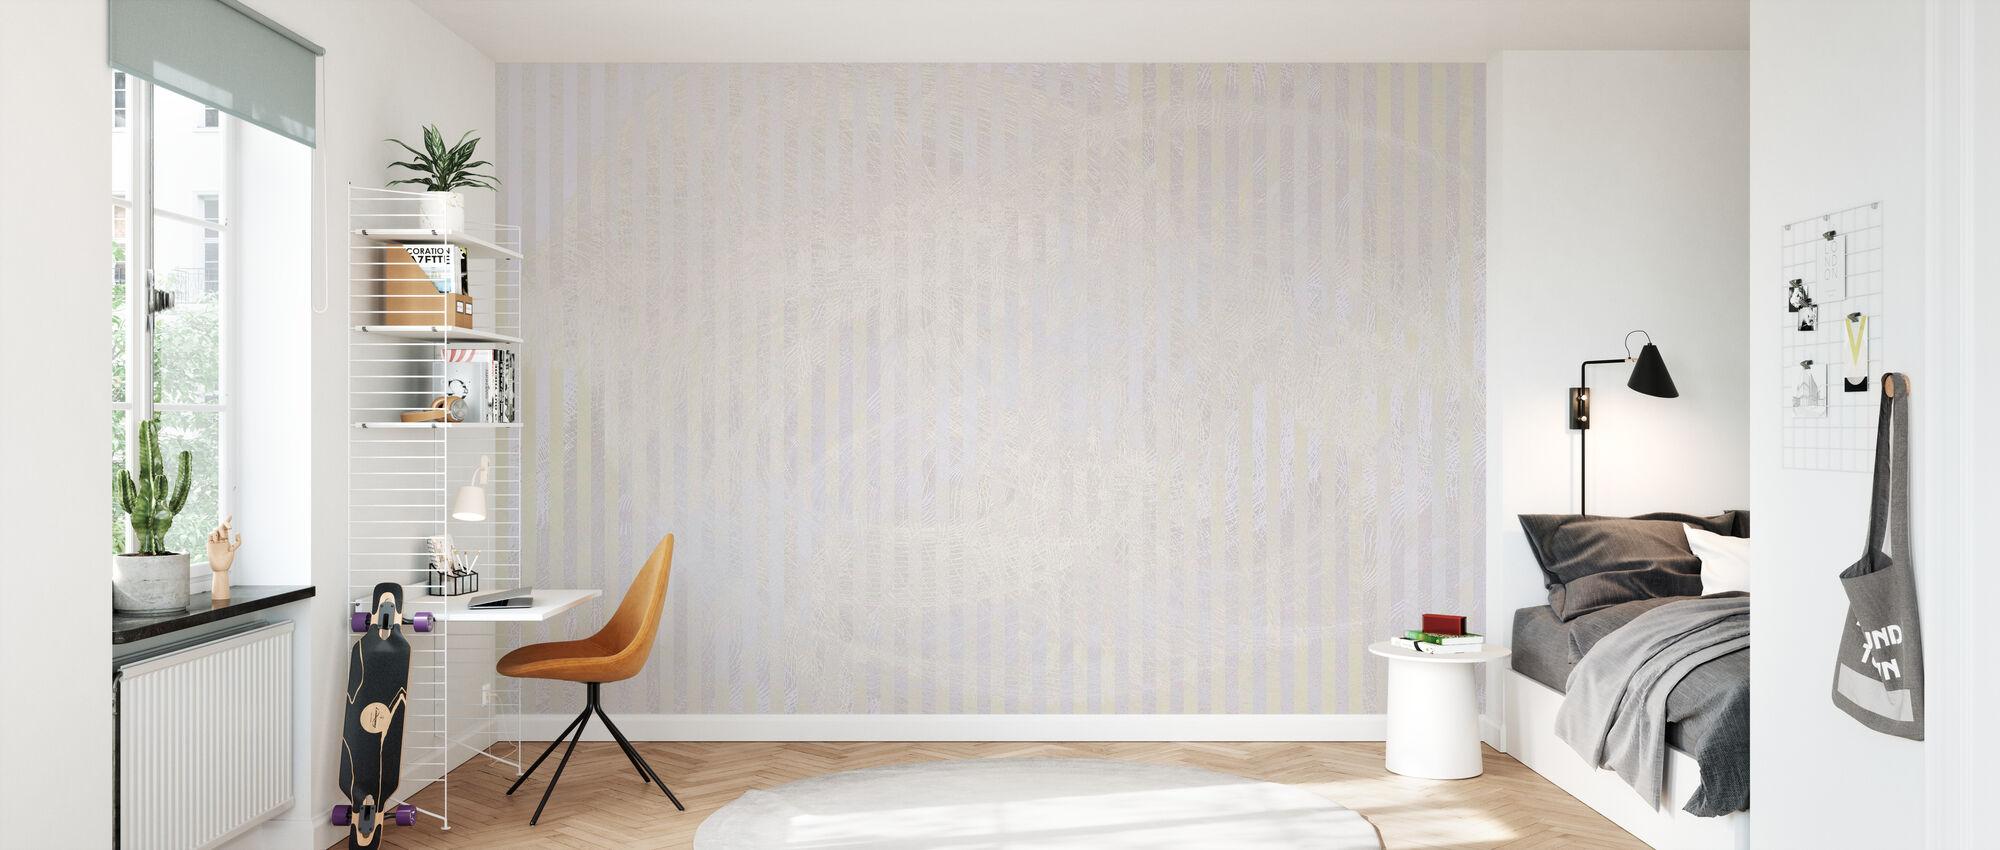 Specular Reflection - Light Purple - Wallpaper - Kids Room